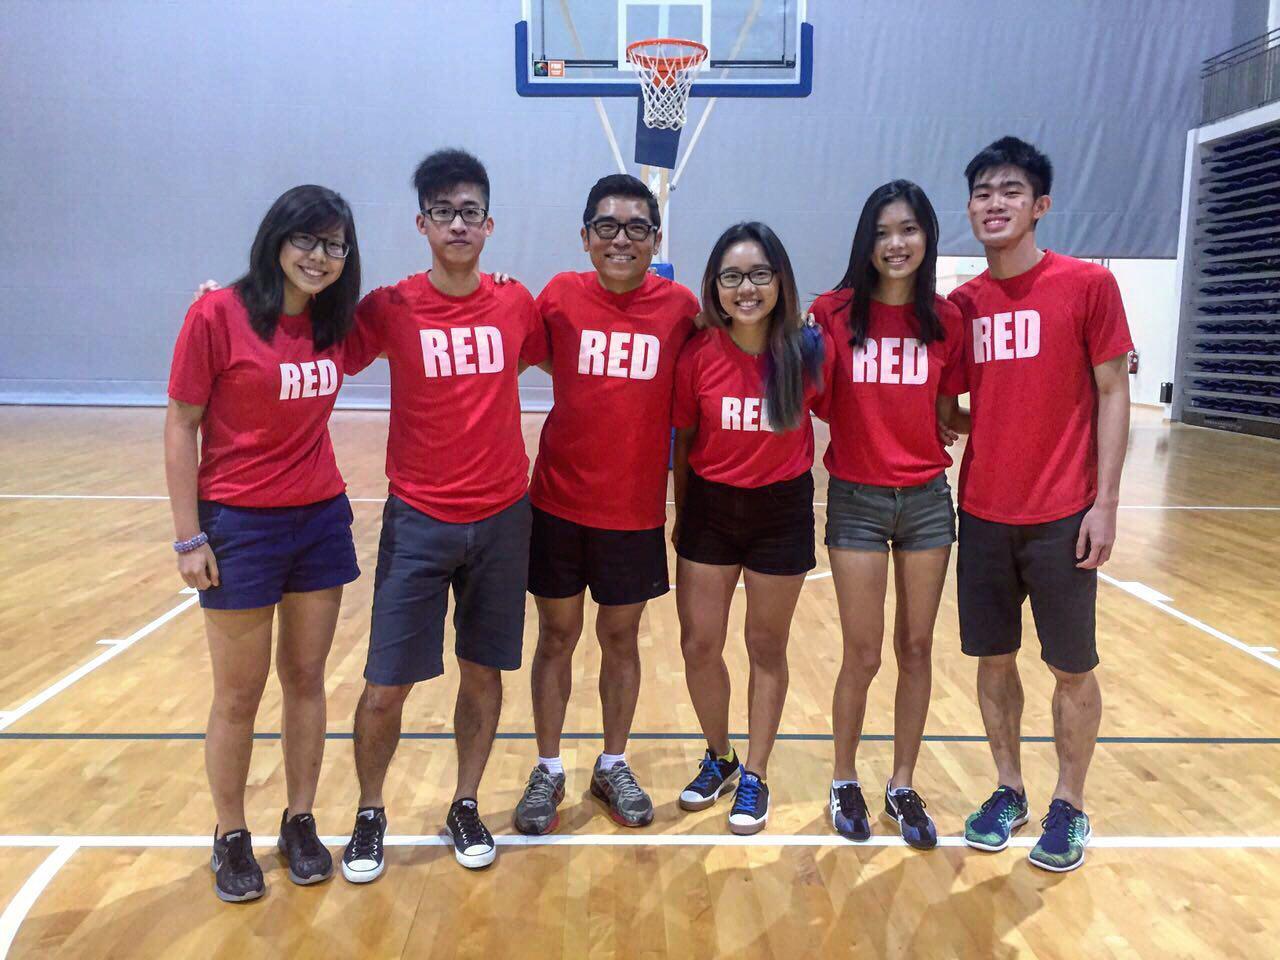 Red Crew 2016. L-R: Denise Chia, Chan Hua Zheng, Les Tan (Editor), Edina Tan, Tamara Lie, Dylan Chua